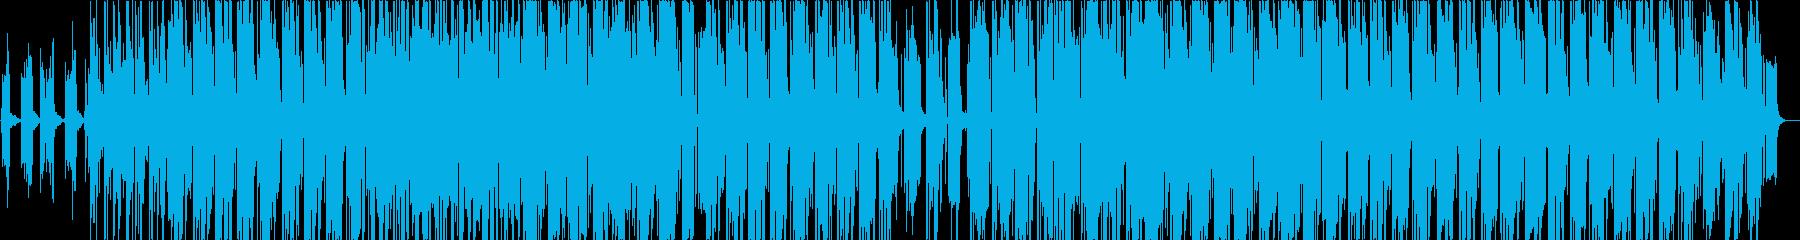 R&B/スペイン語/女性ボーカル/情熱的の再生済みの波形